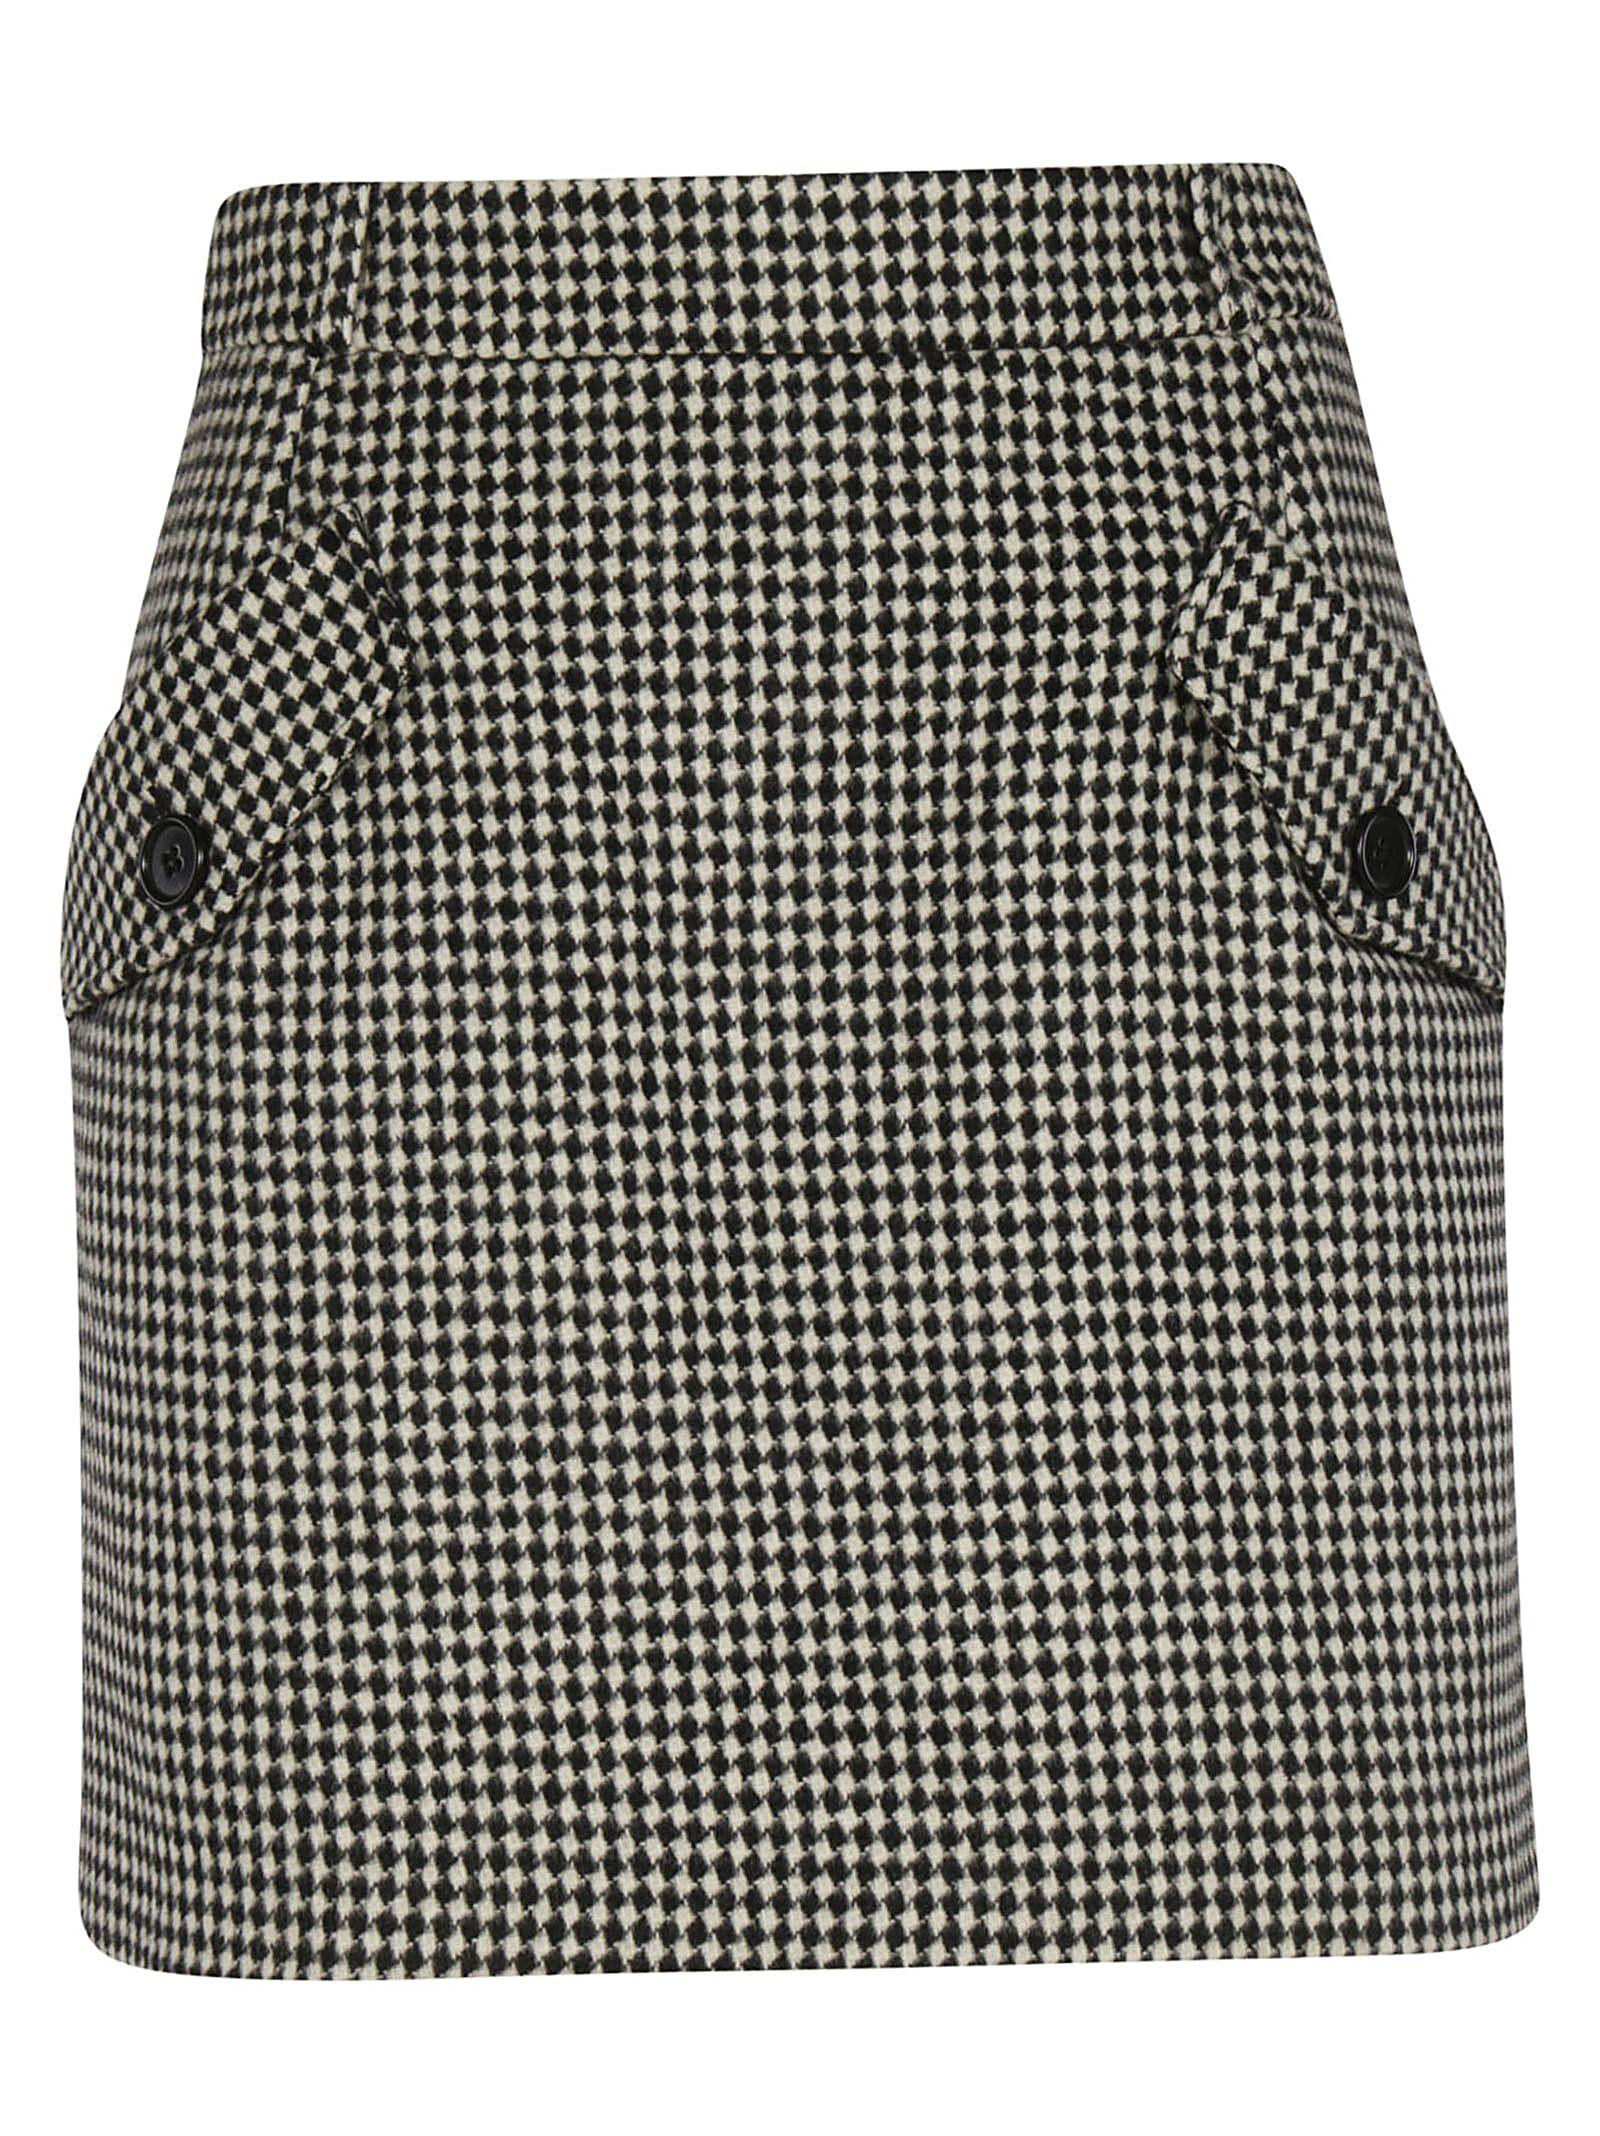 Tara Jarmon Checked Skirt